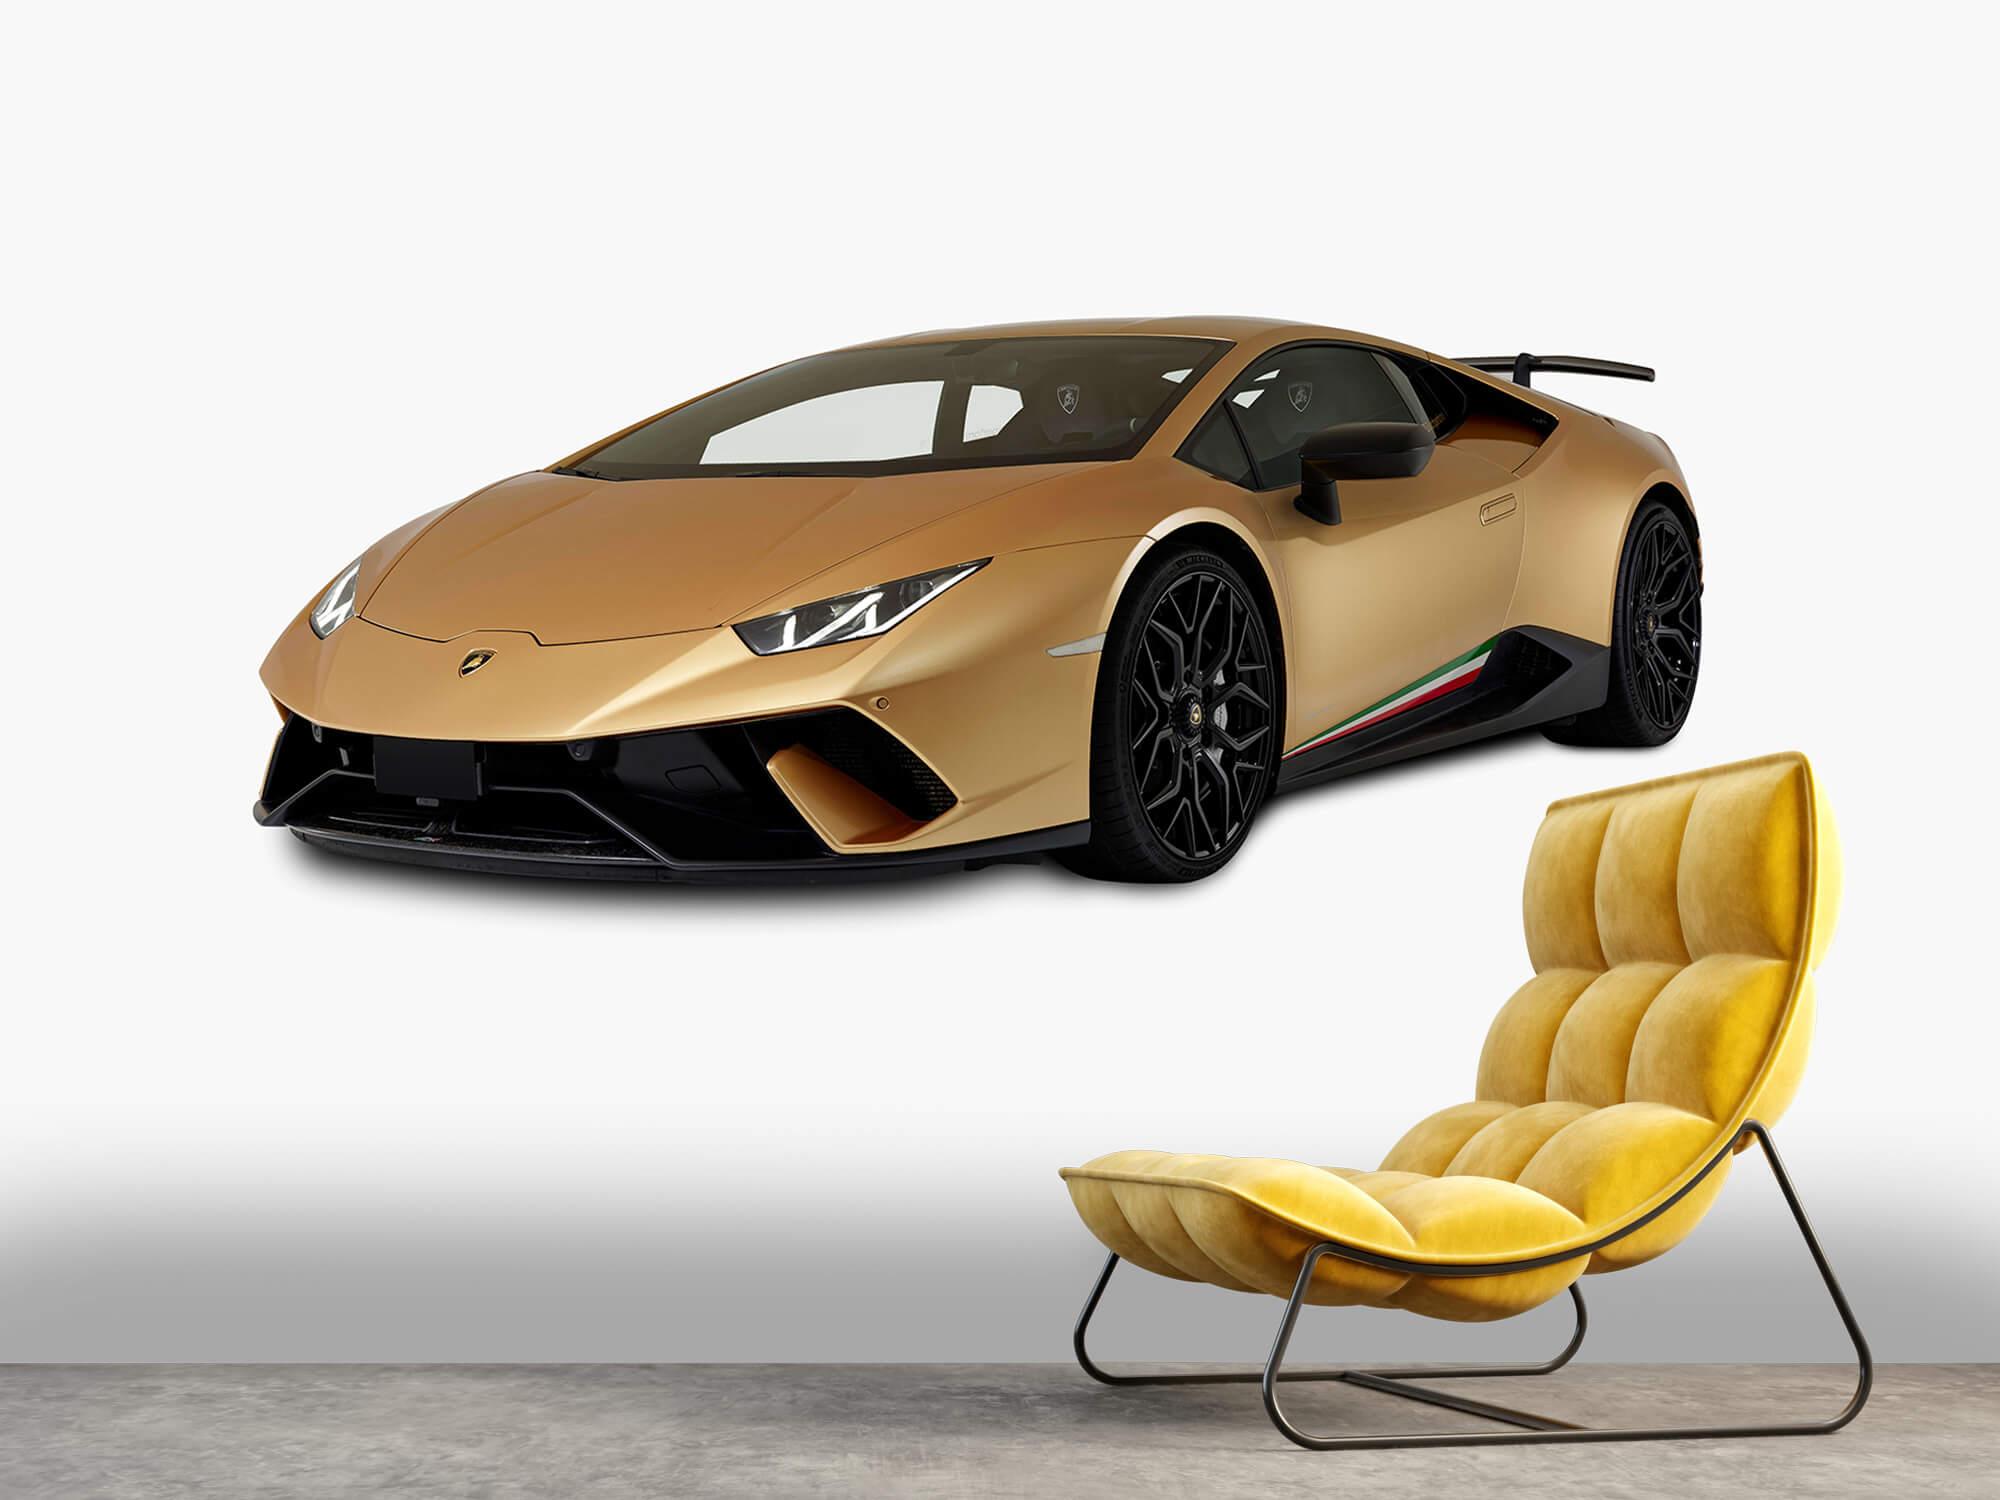 Wallpaper Lamborghini Huracán - Rechter voorkant wit 7